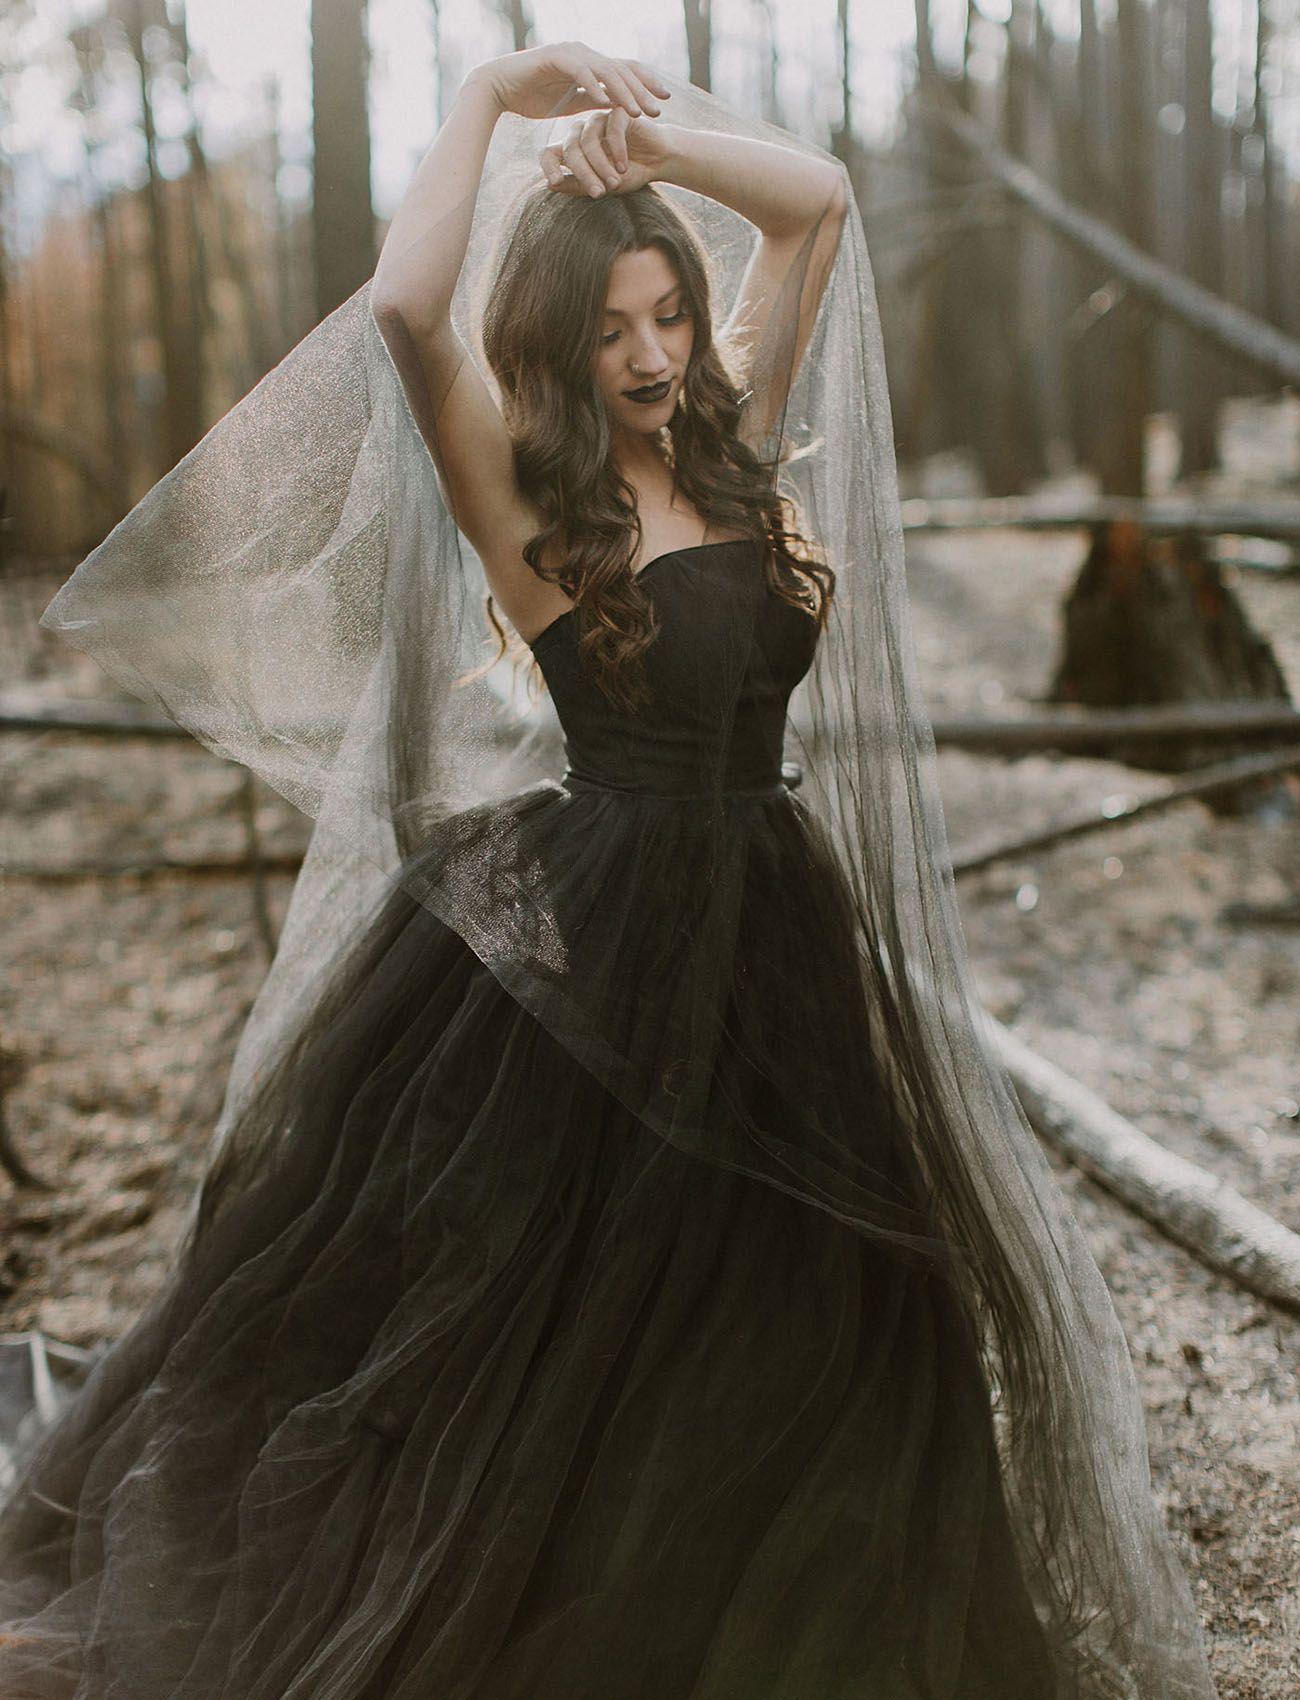 Paint It Black Our Favorite Black Wedding Dresses Green Wedding Shoes Black Wedding Gowns Gothic Wedding Dress Halloween Wedding Dresses